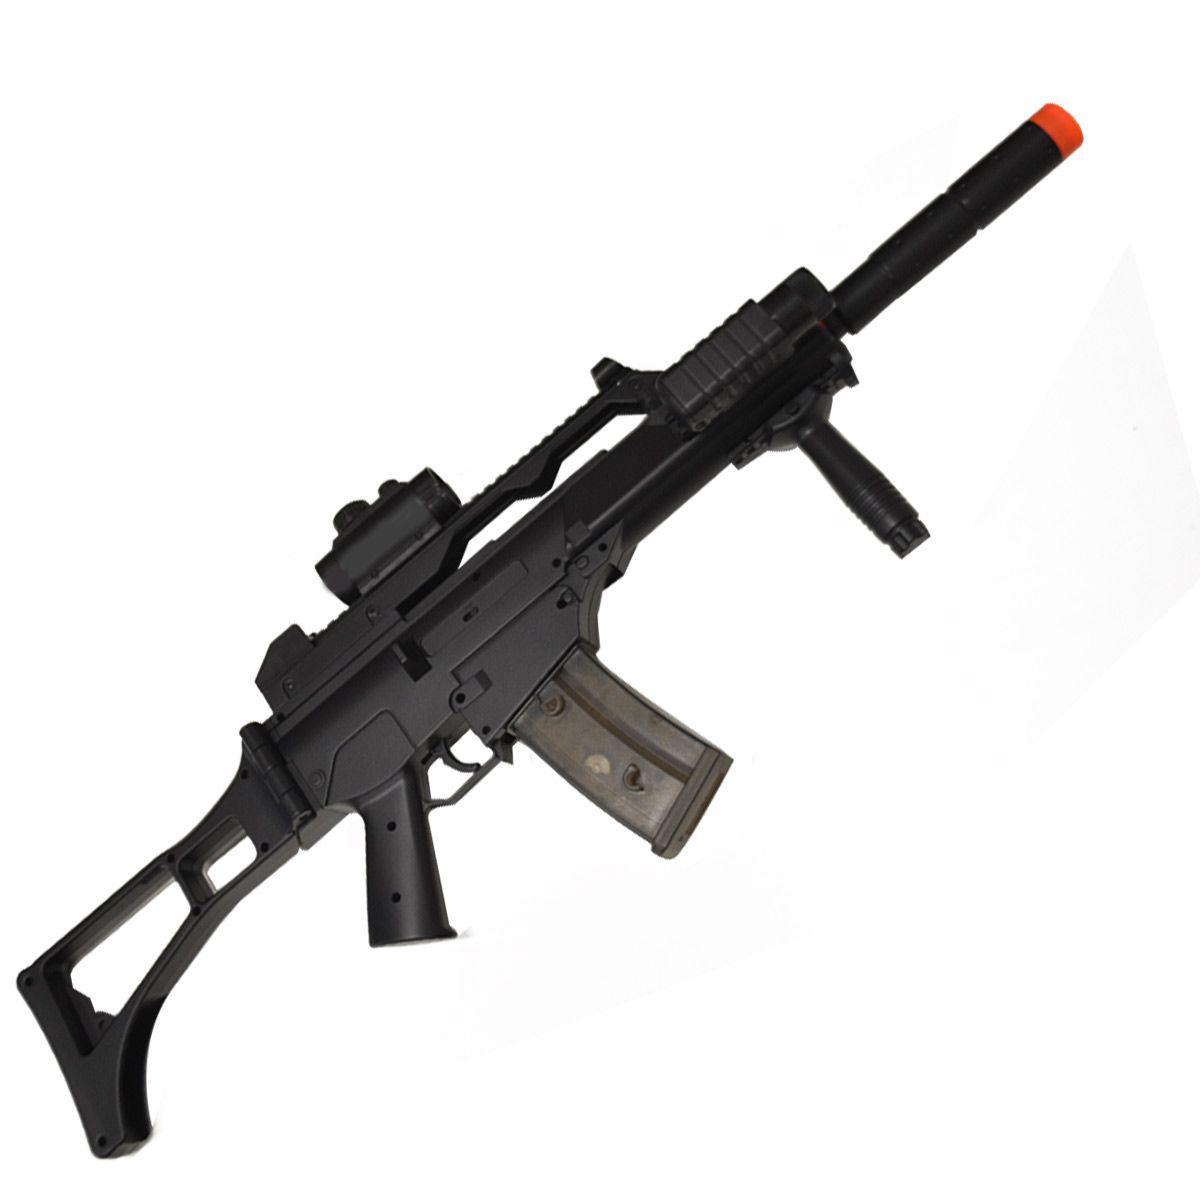 Rifle de Airsoft Cyma G36 CM021 Polímero Elétrica 6mm